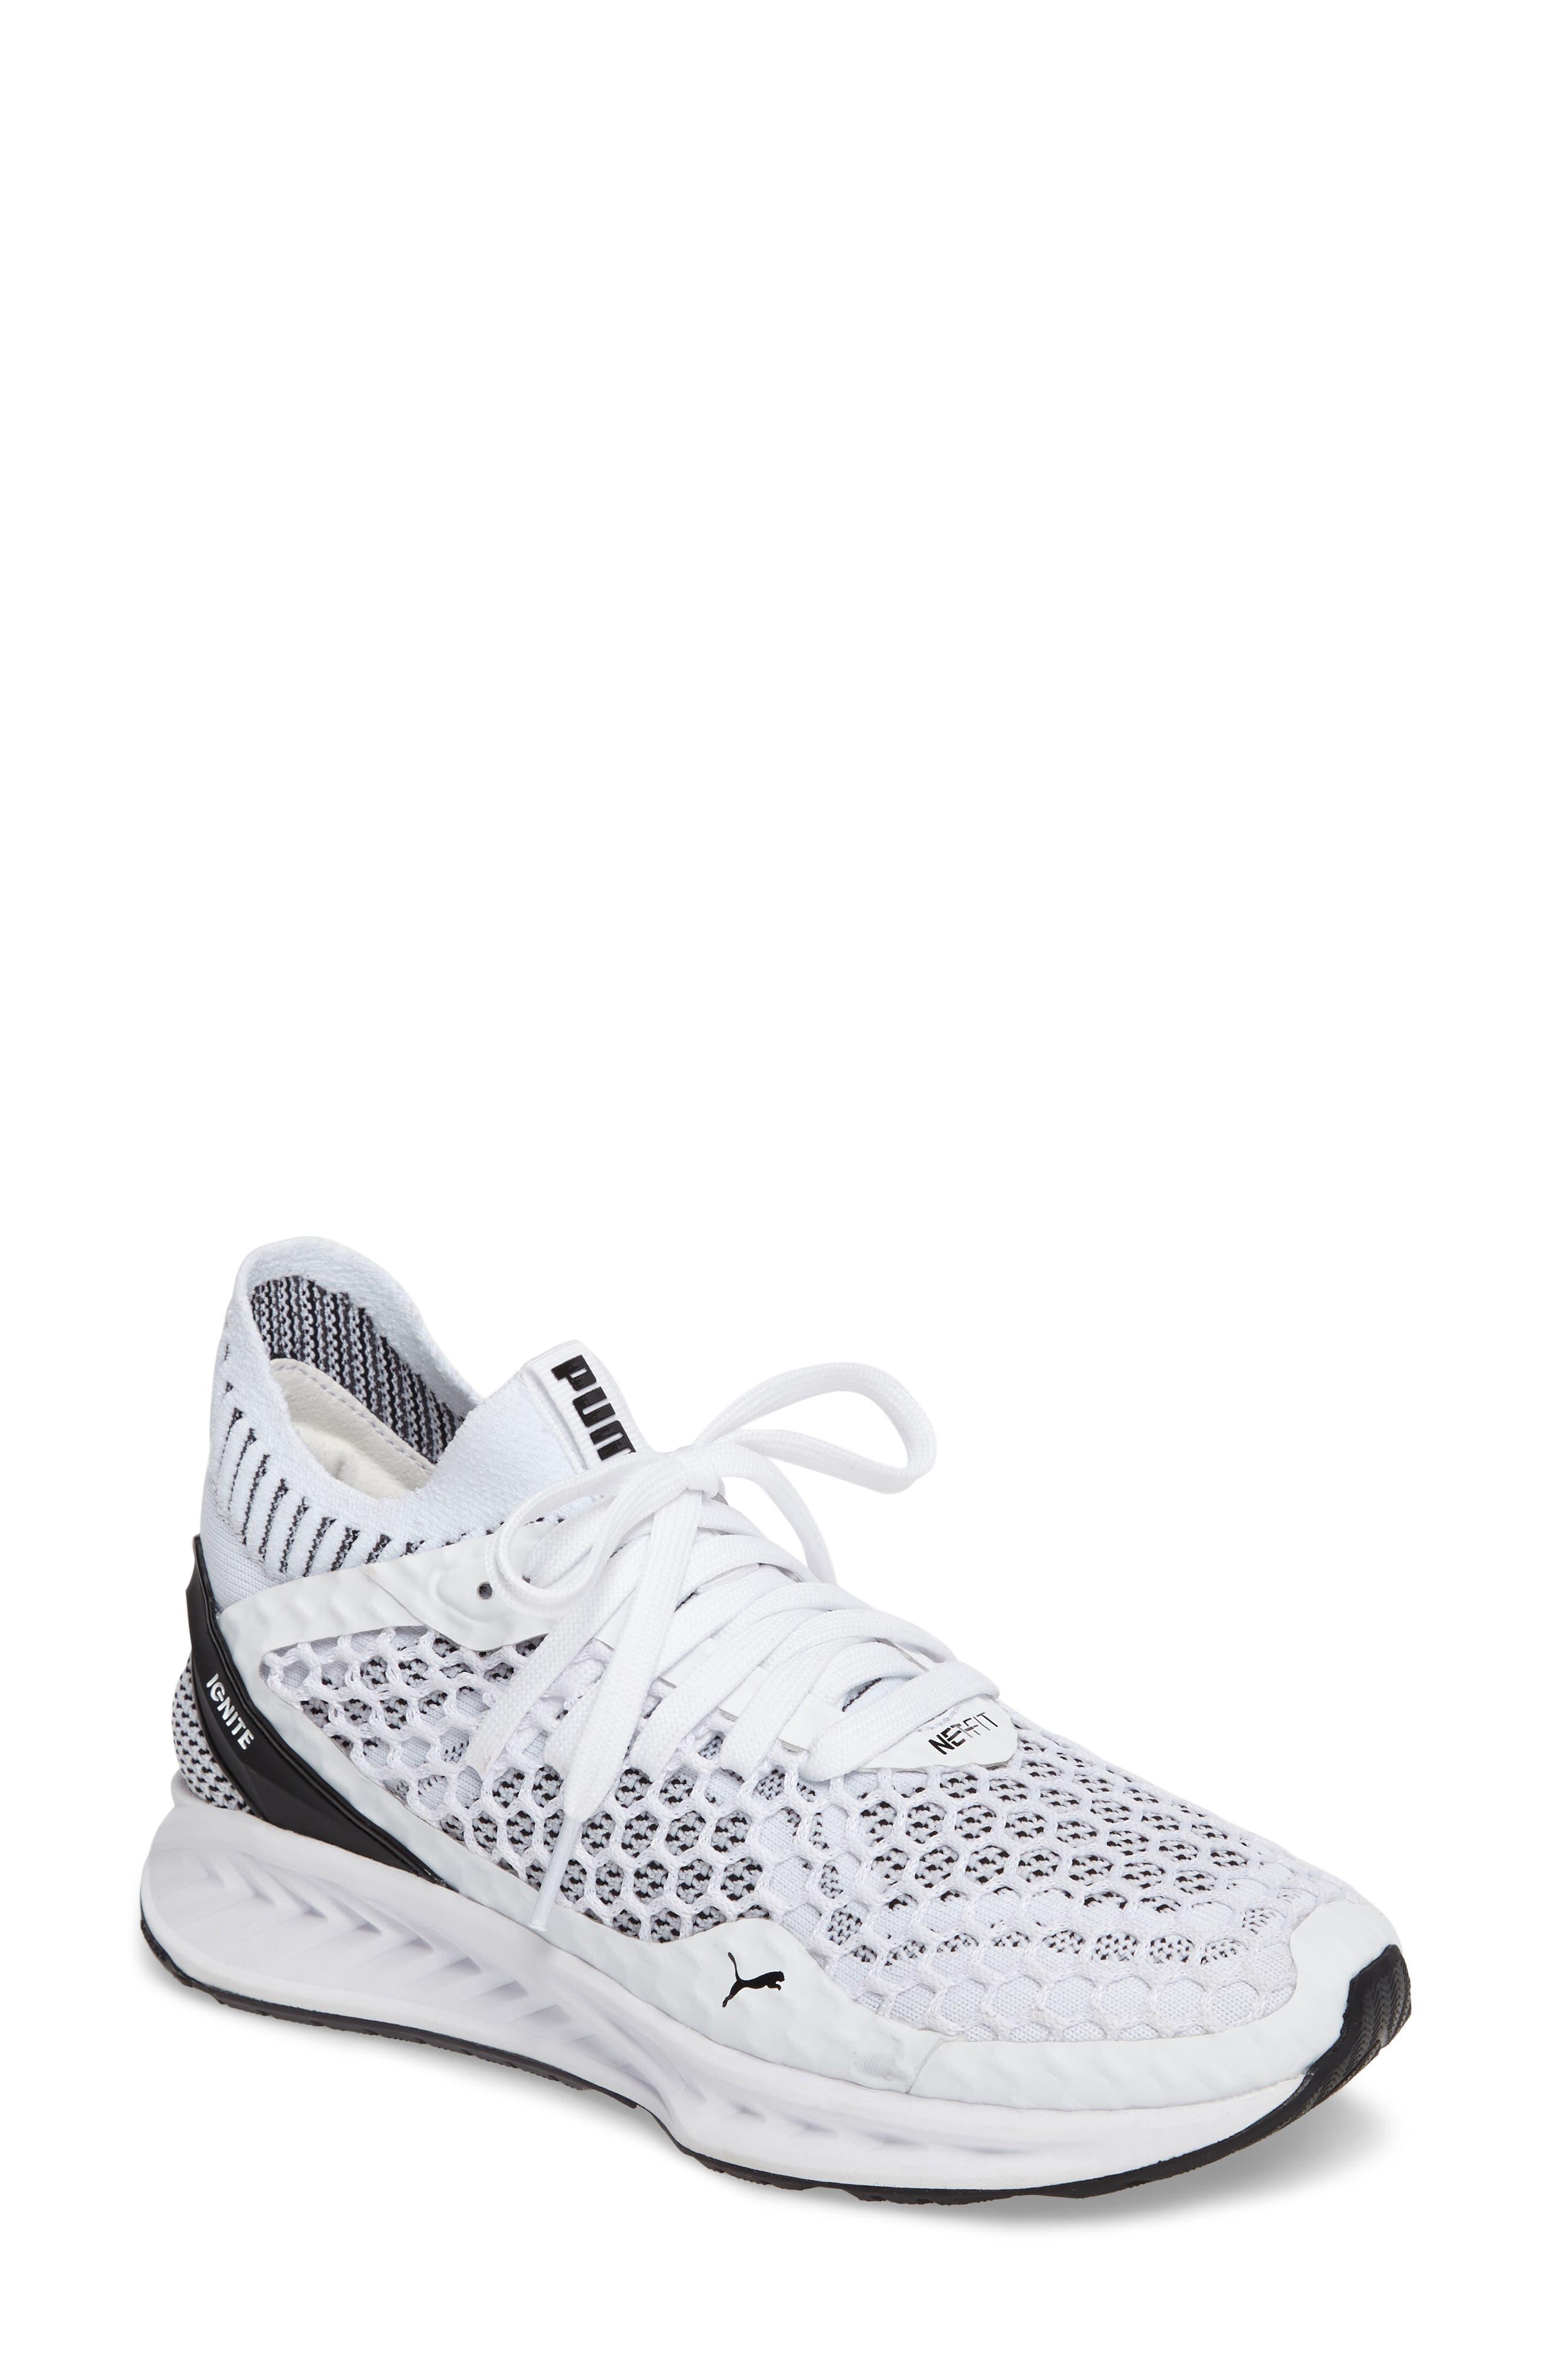 IGNITE evoKNIT Running Shoe,                             Main thumbnail 1, color,                             White/ Black